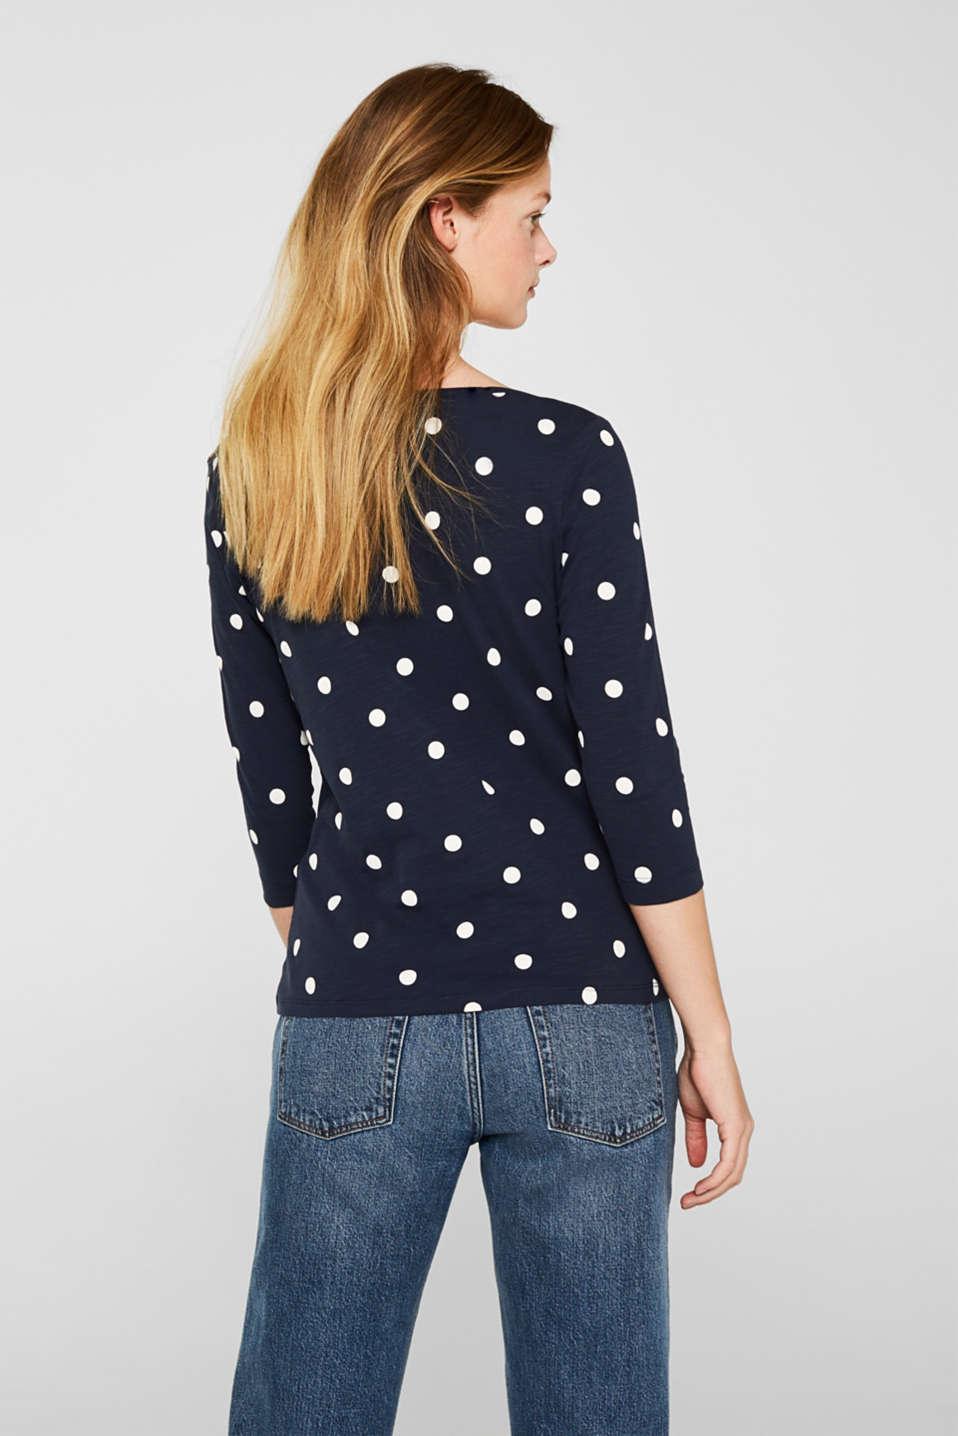 Printed slub jersey T-shirt in 100% cotton, NAVY, detail image number 3